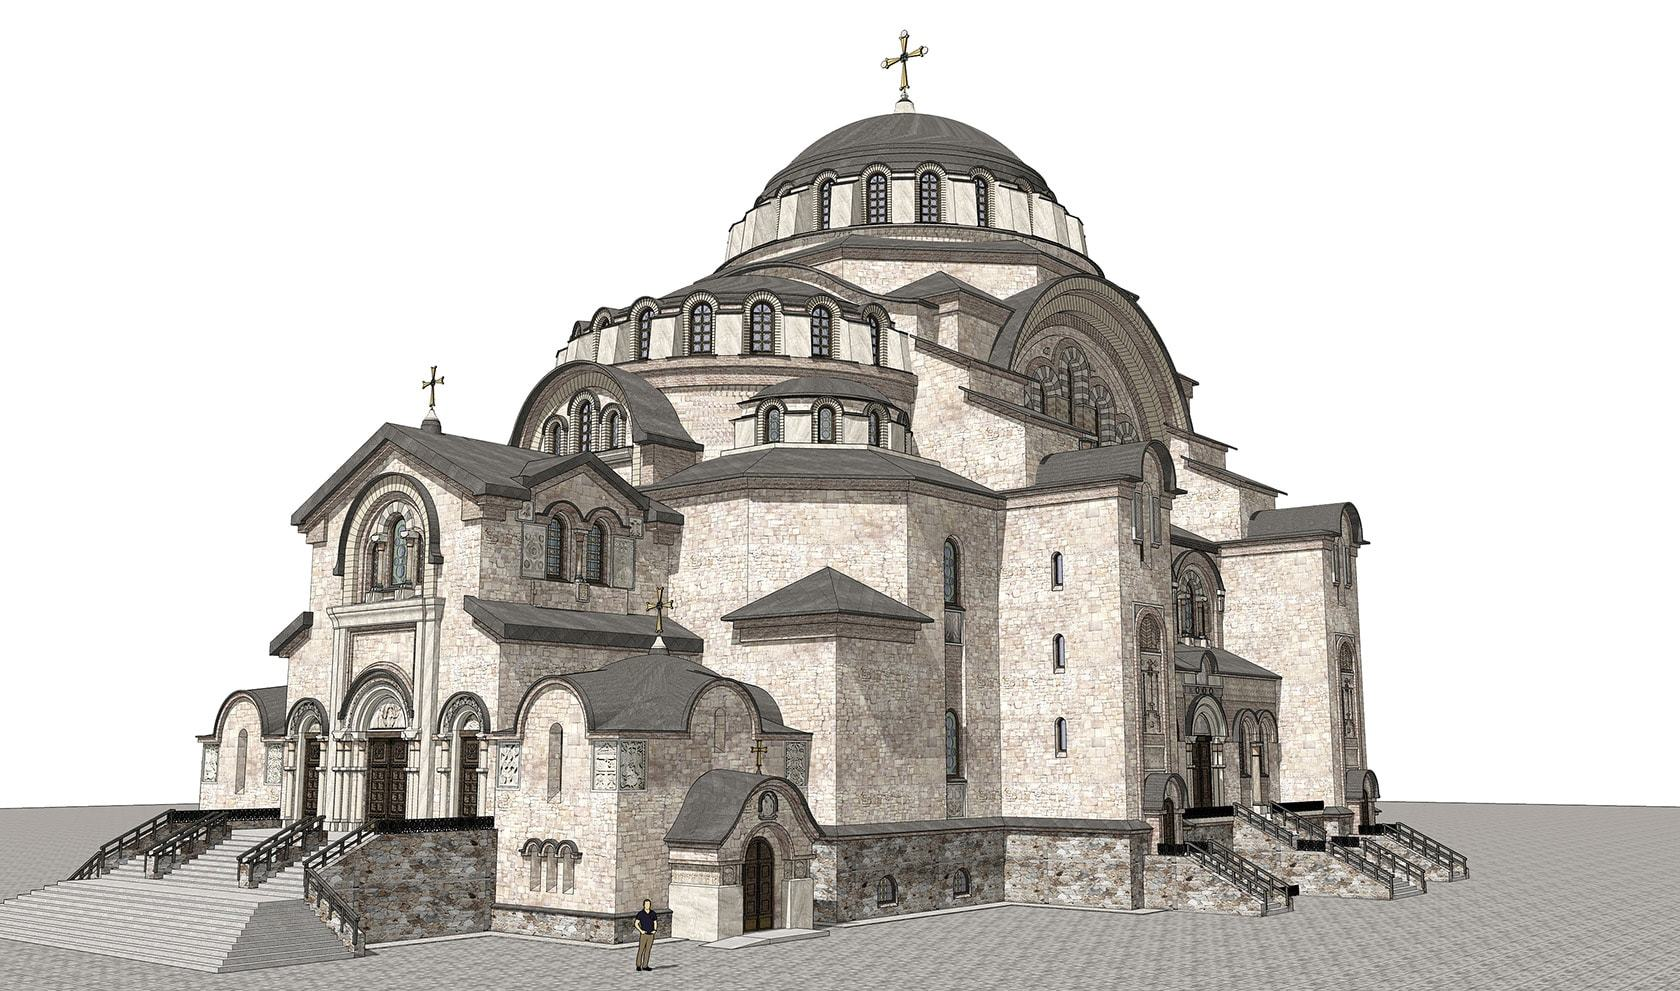 византийский храм, архитектурный проект храма,